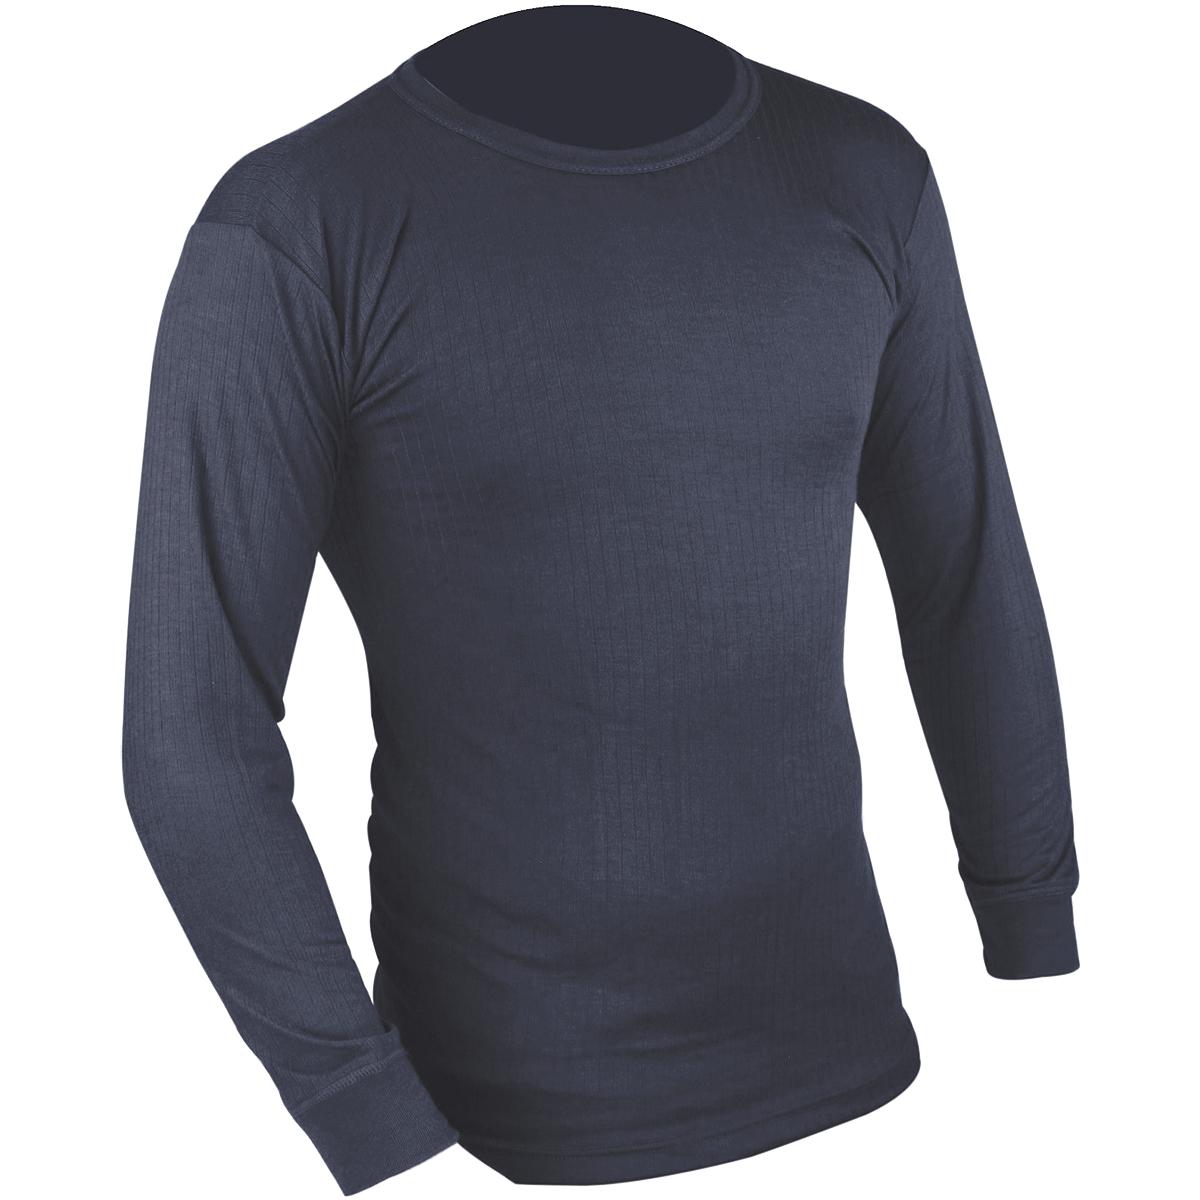 Highlander Long Sleeve Thermal Vest Mens Base Layer Shirt Military ...